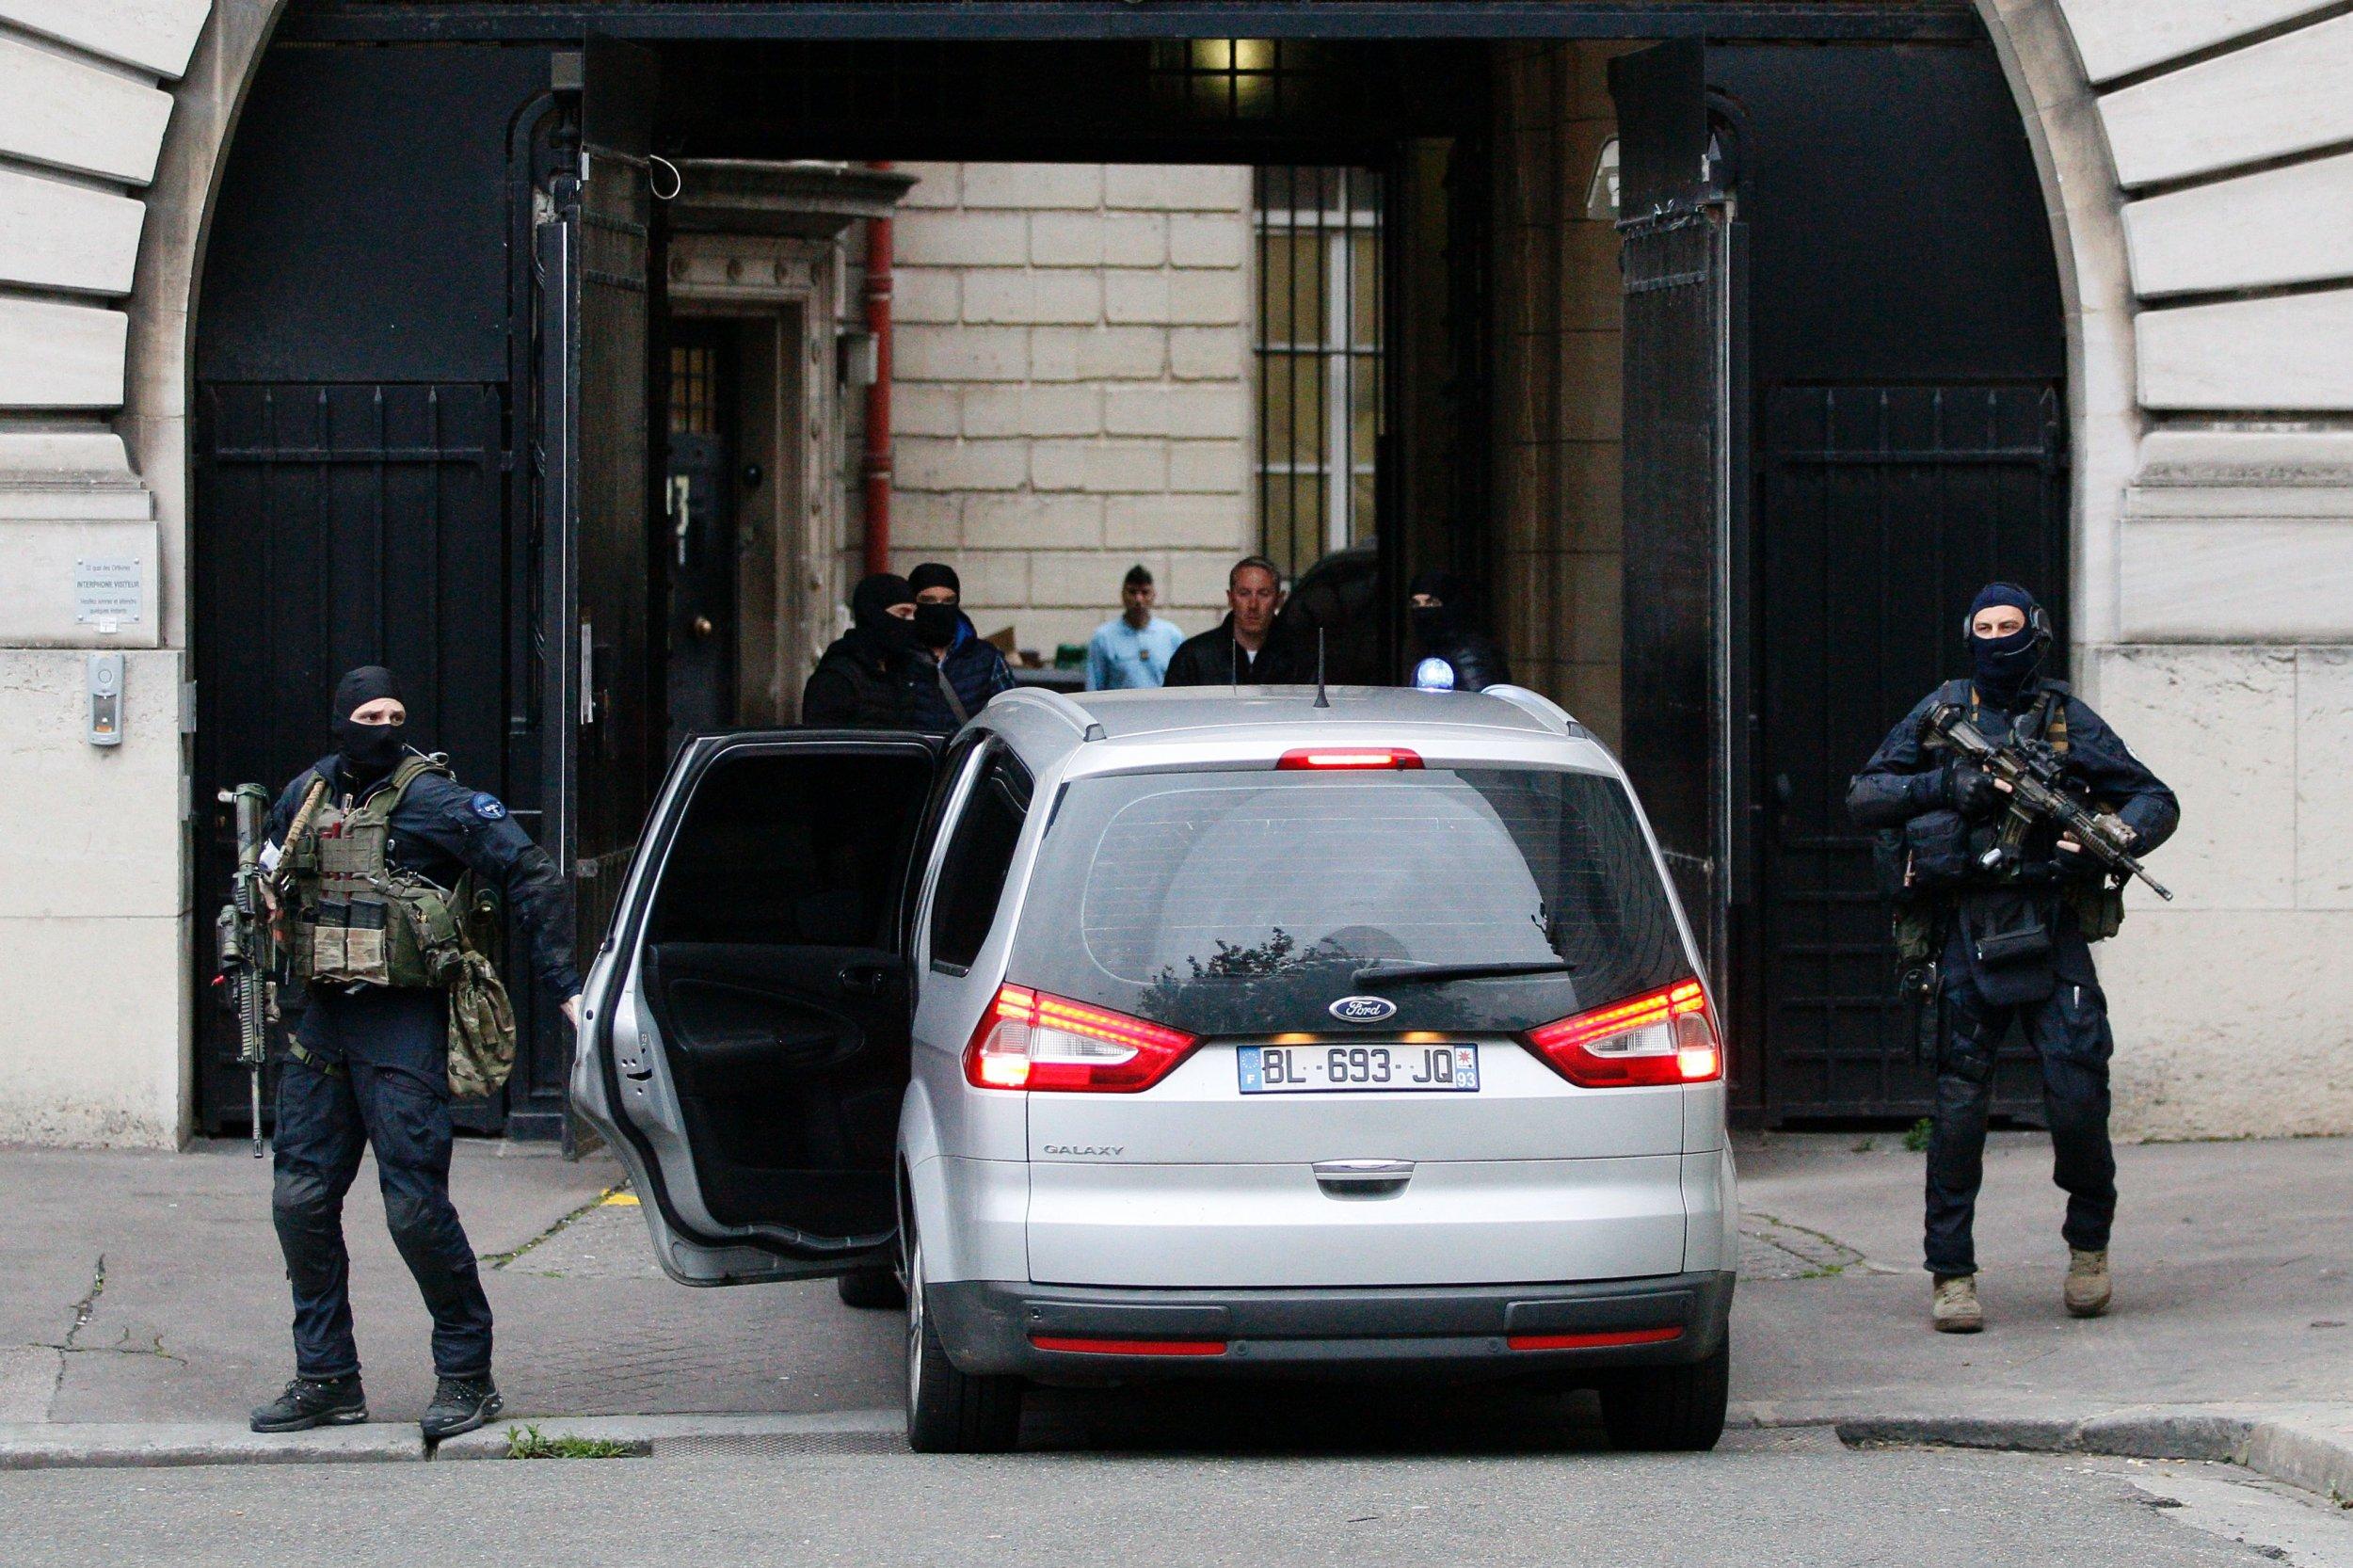 Paris Attacks suspect Salah Abdeslam convoy